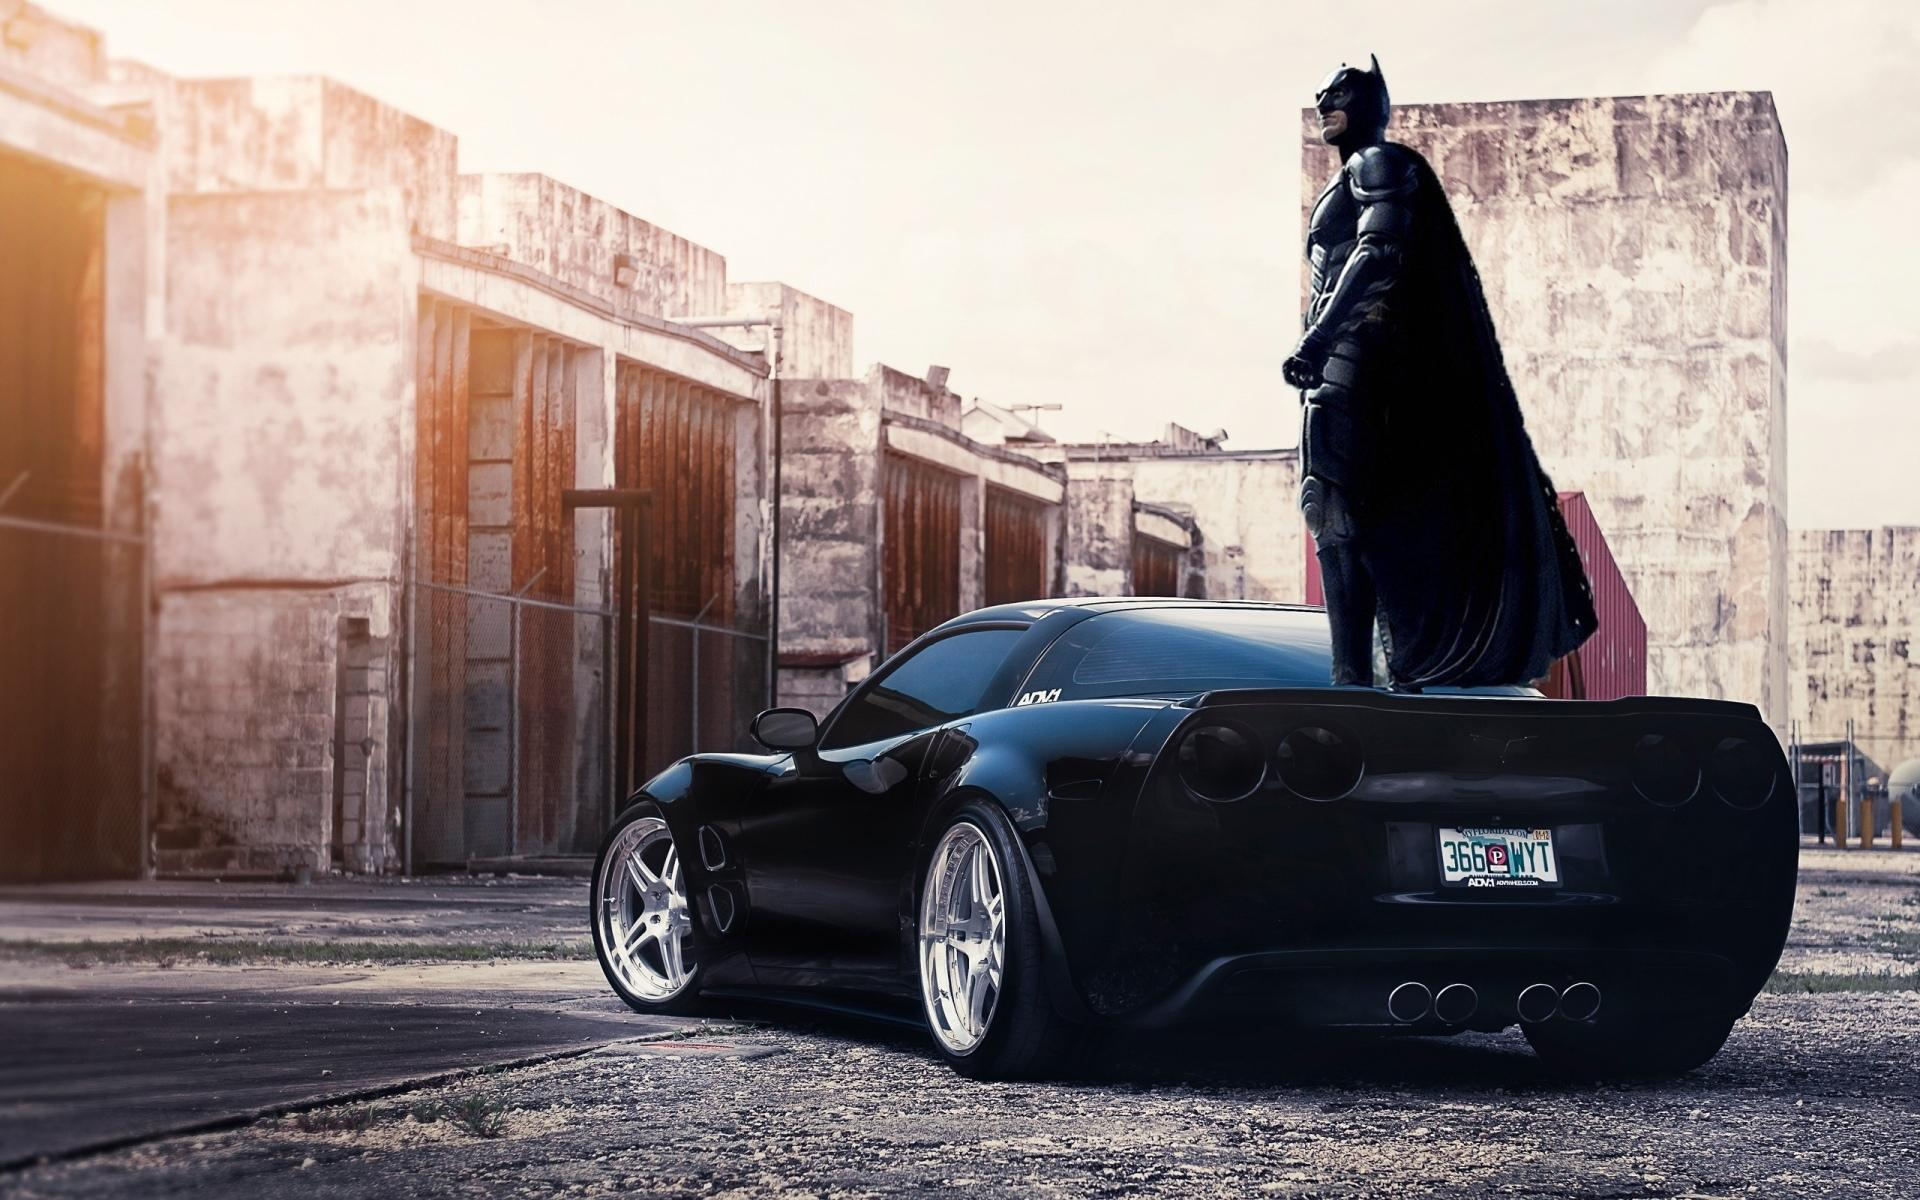 Batman Artistic wallpapers HD quality